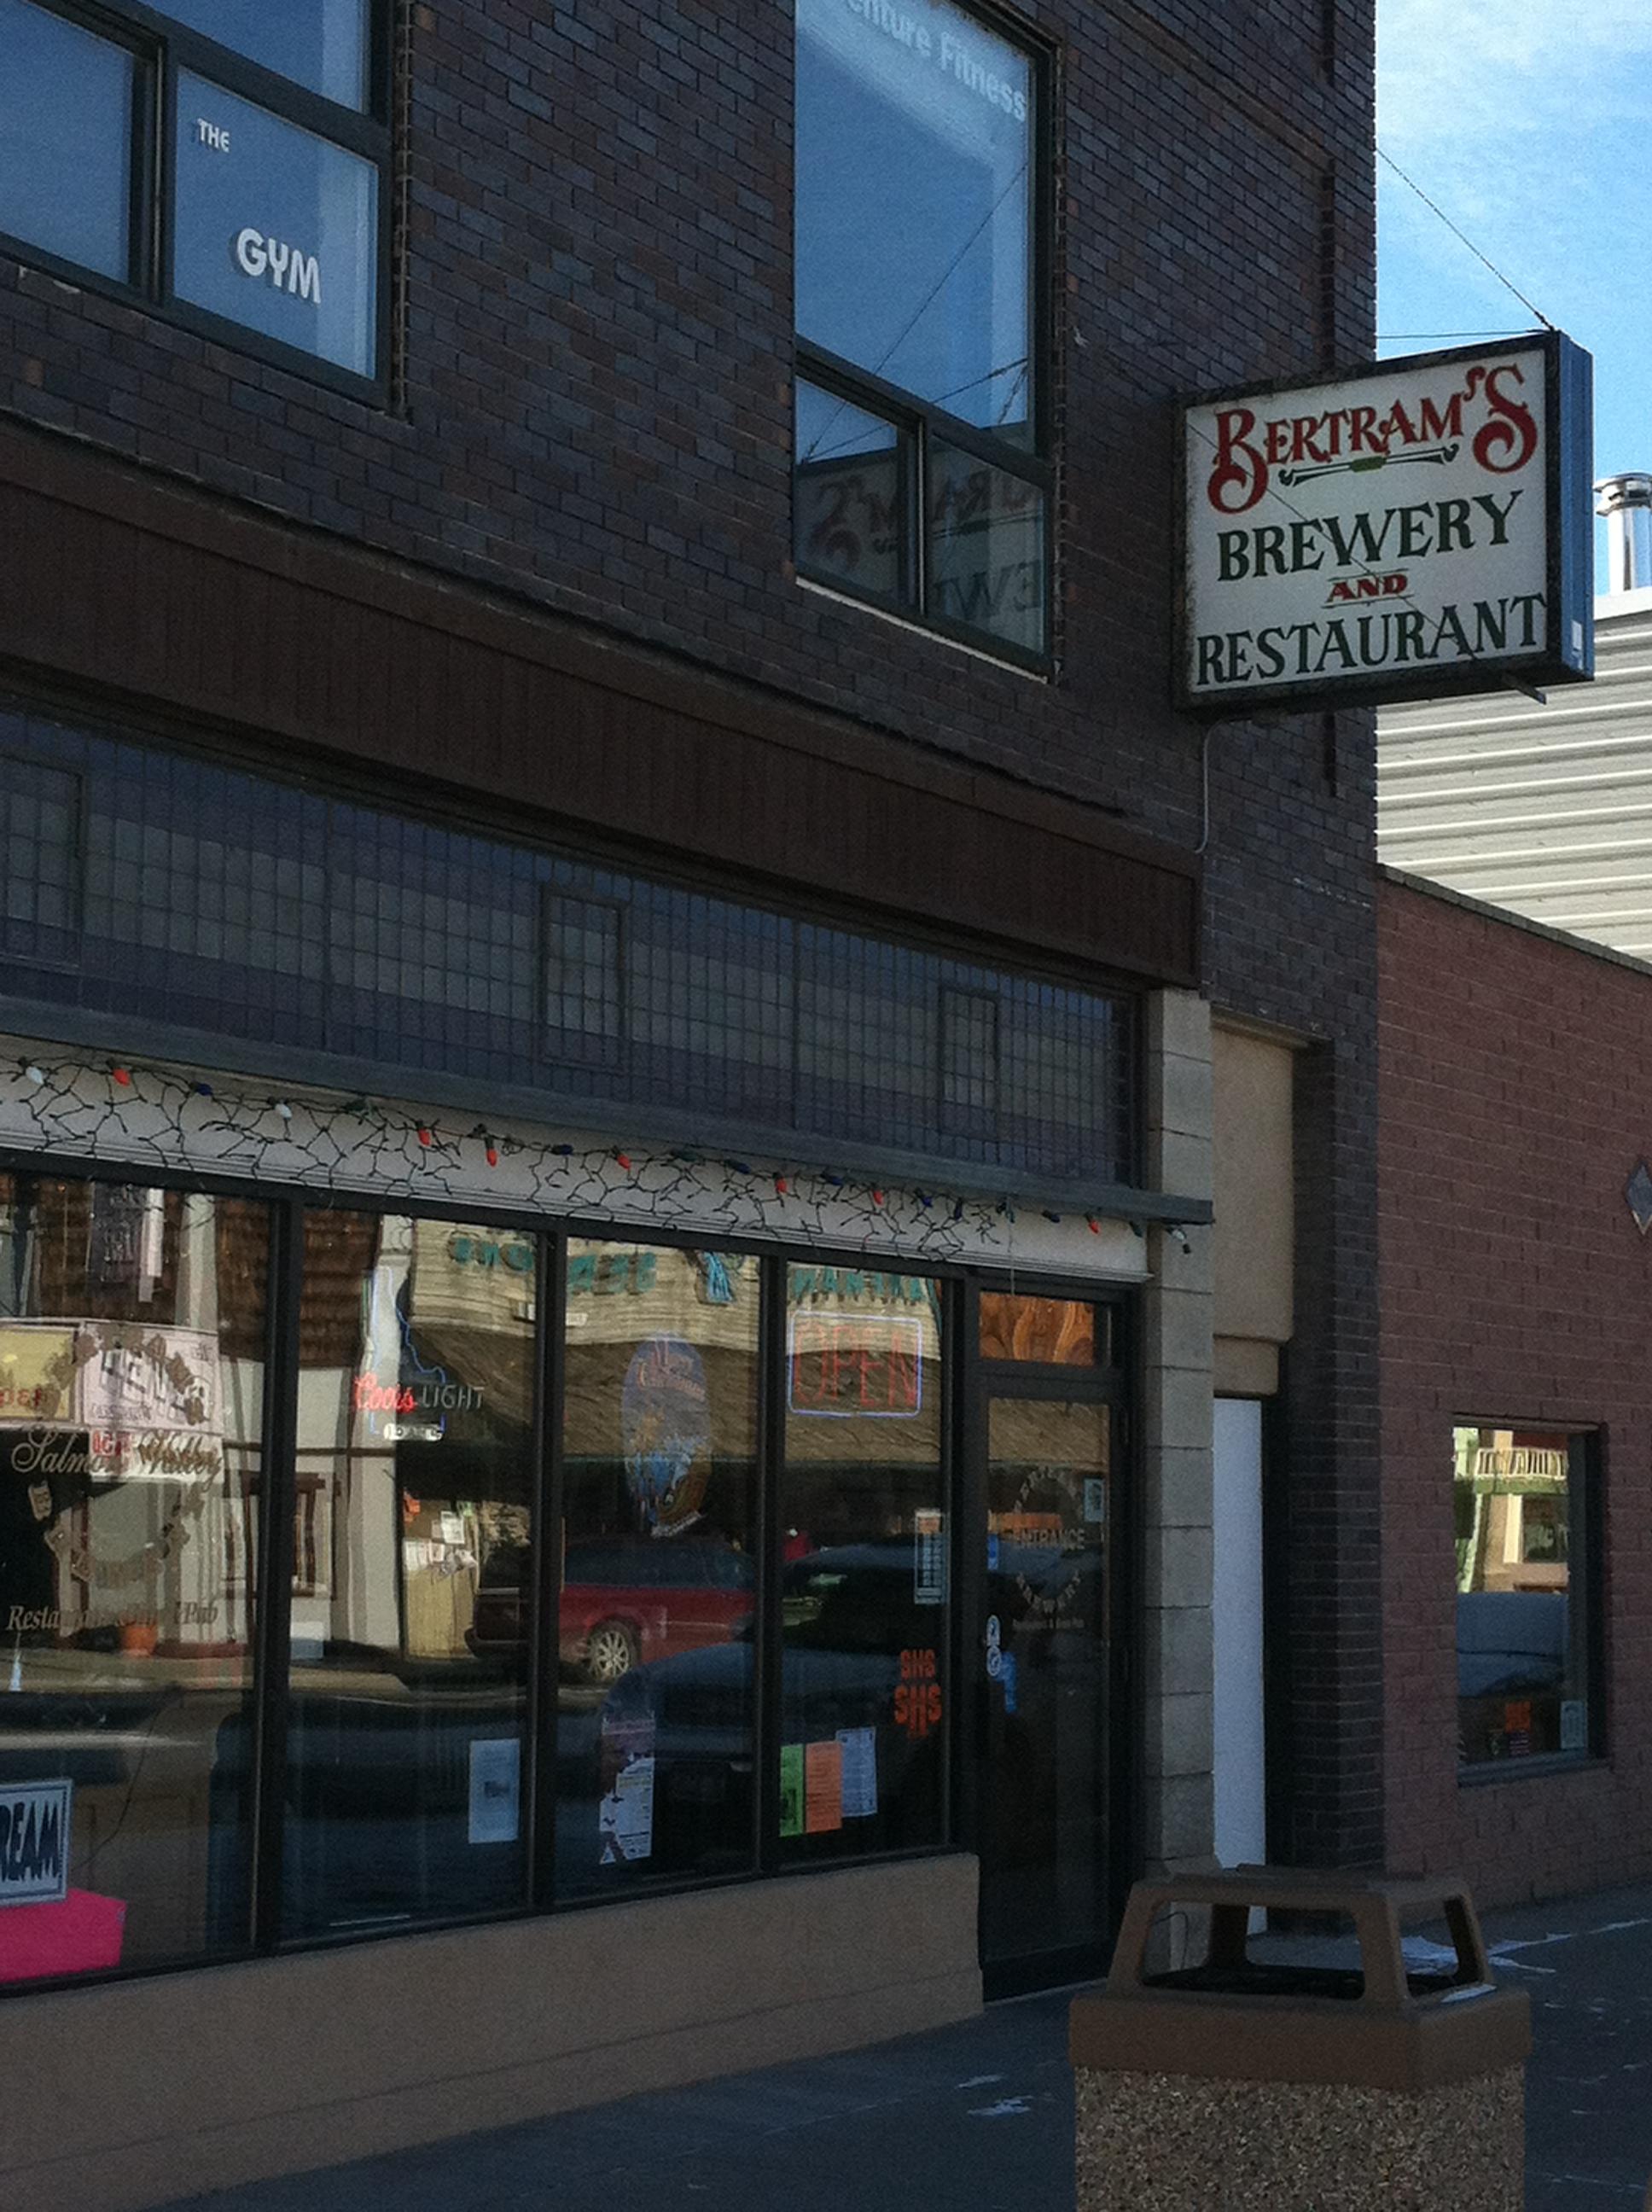 Bertram's Brewery and Restaurant